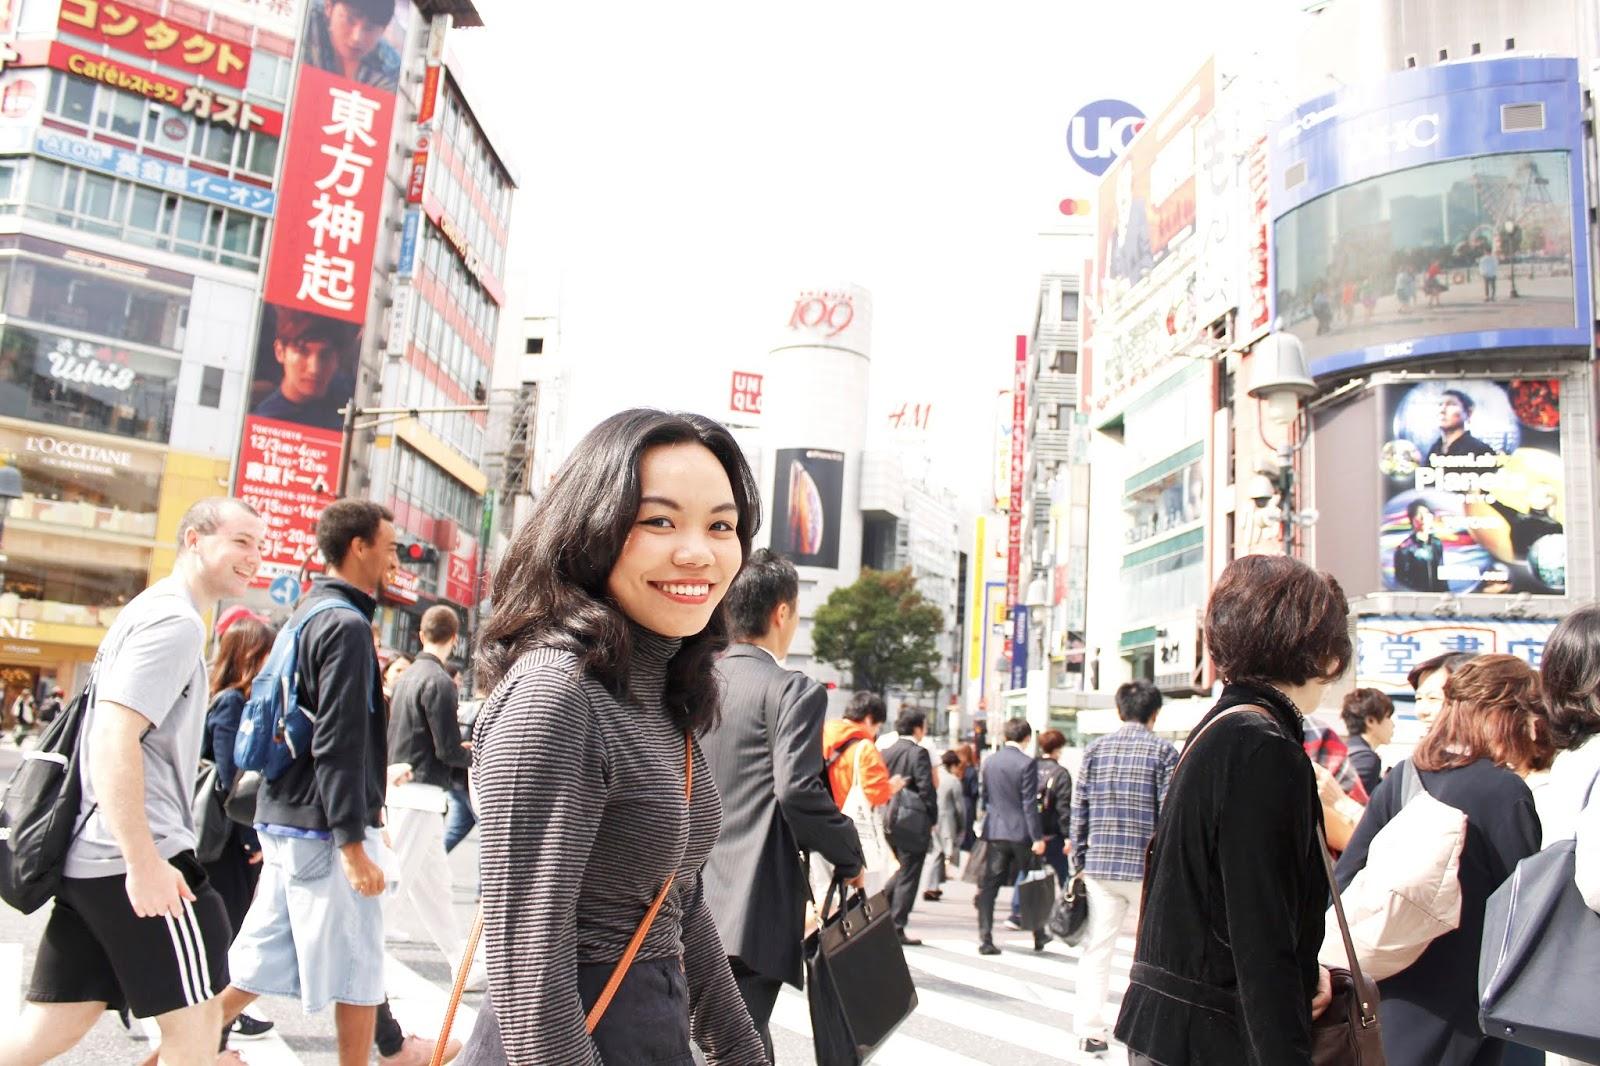 SHIBUYA & ASAKUSA : 2 5 Hour Being a Model [Airbnb